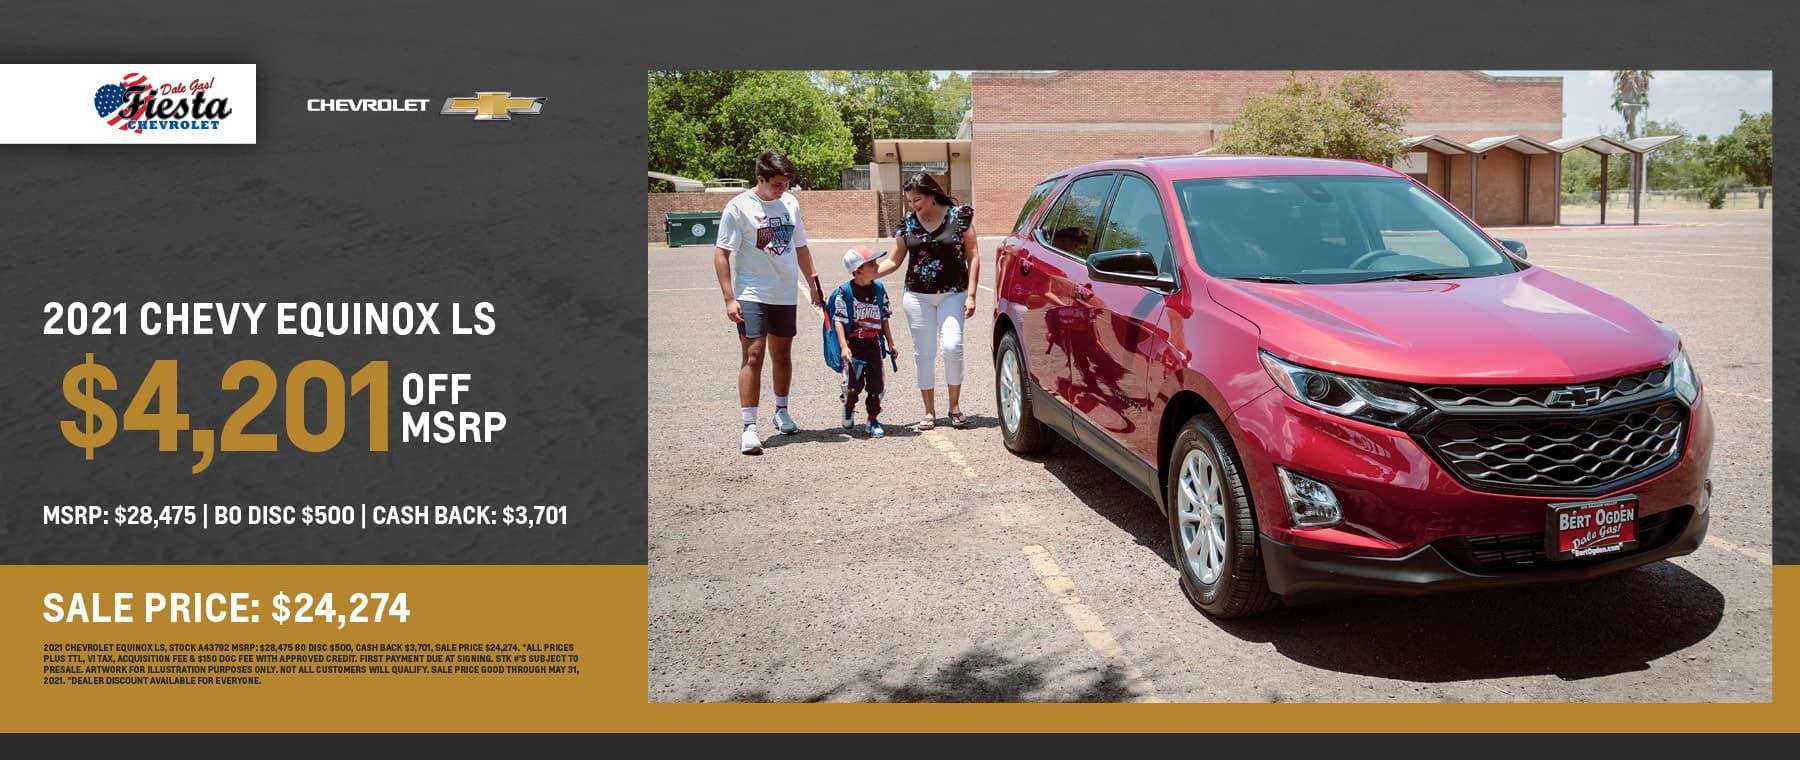 2021 Chevrolet Equinox LS - Fiesta Chevrolet in Edinburg, Texas